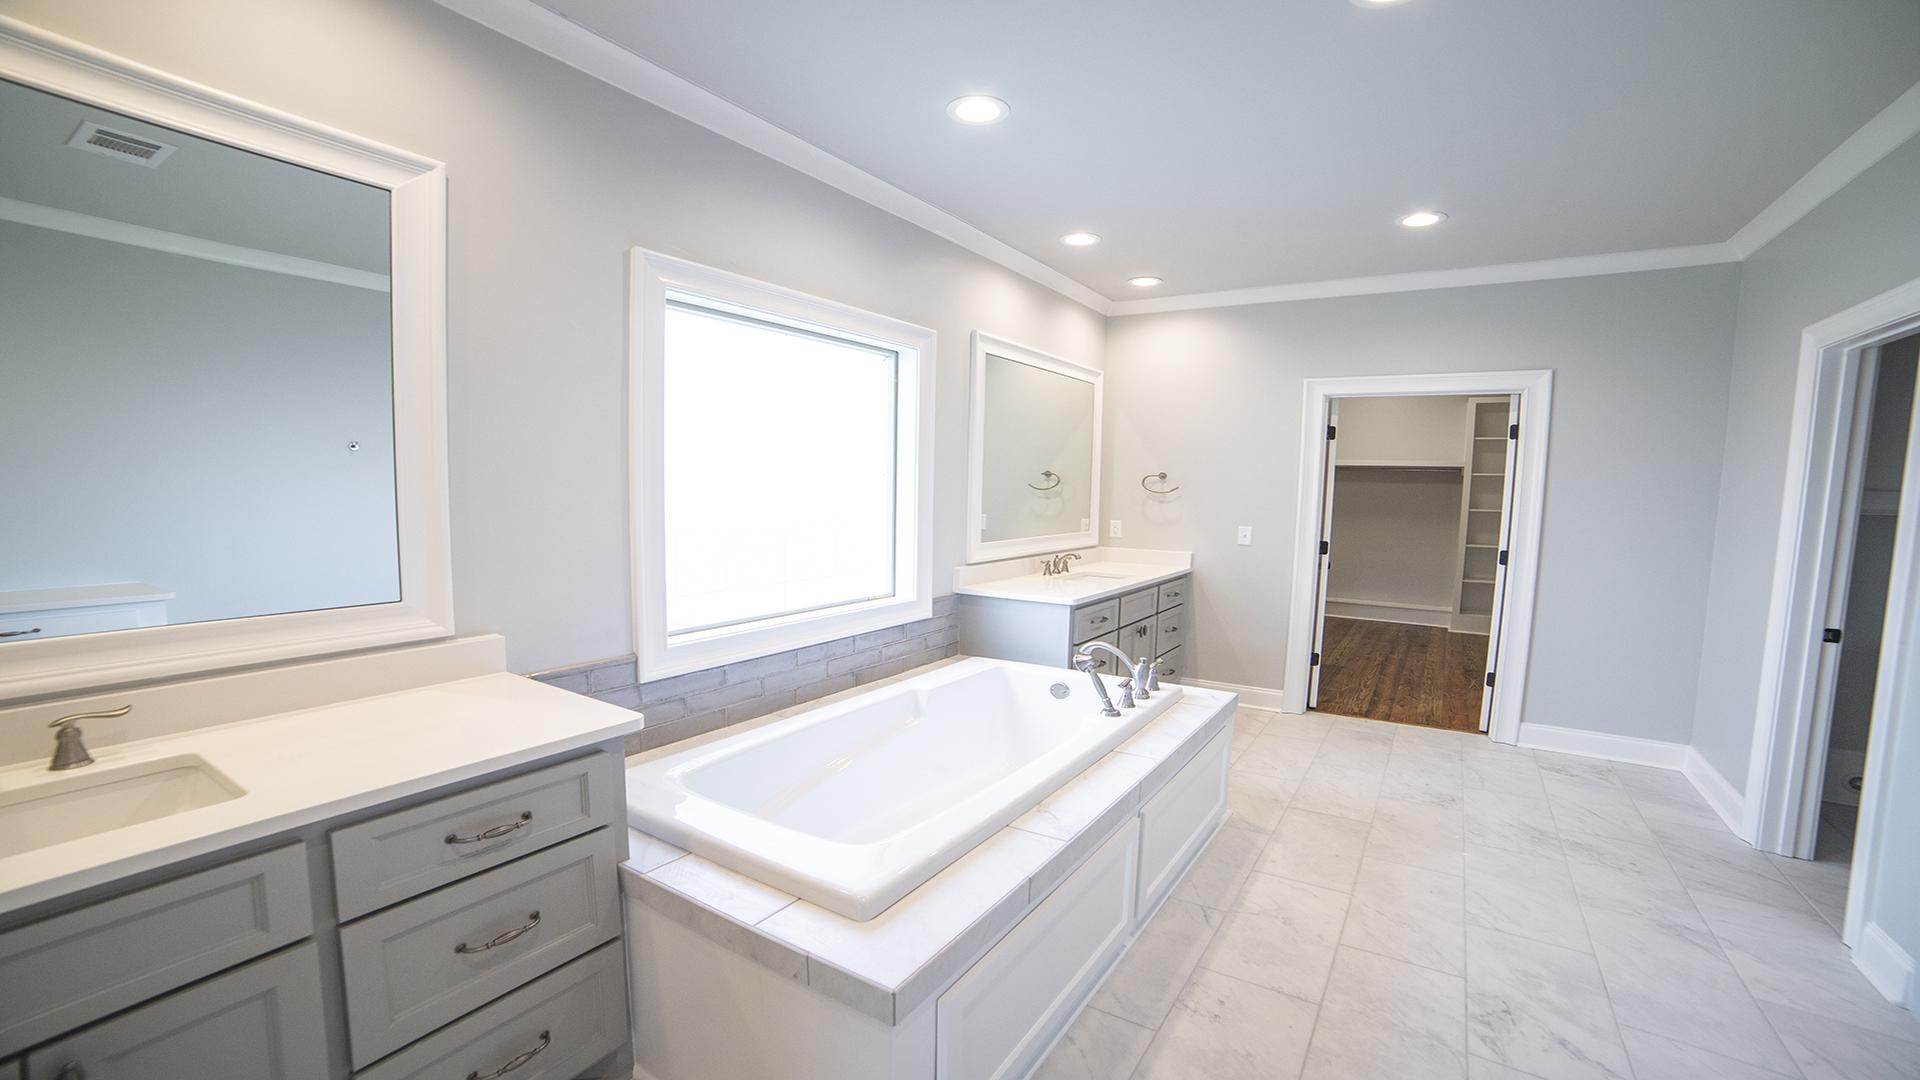 master bath dual vanities 8 inch fixtures walk-in closet hand sprayer drop in tub brandon mississippi